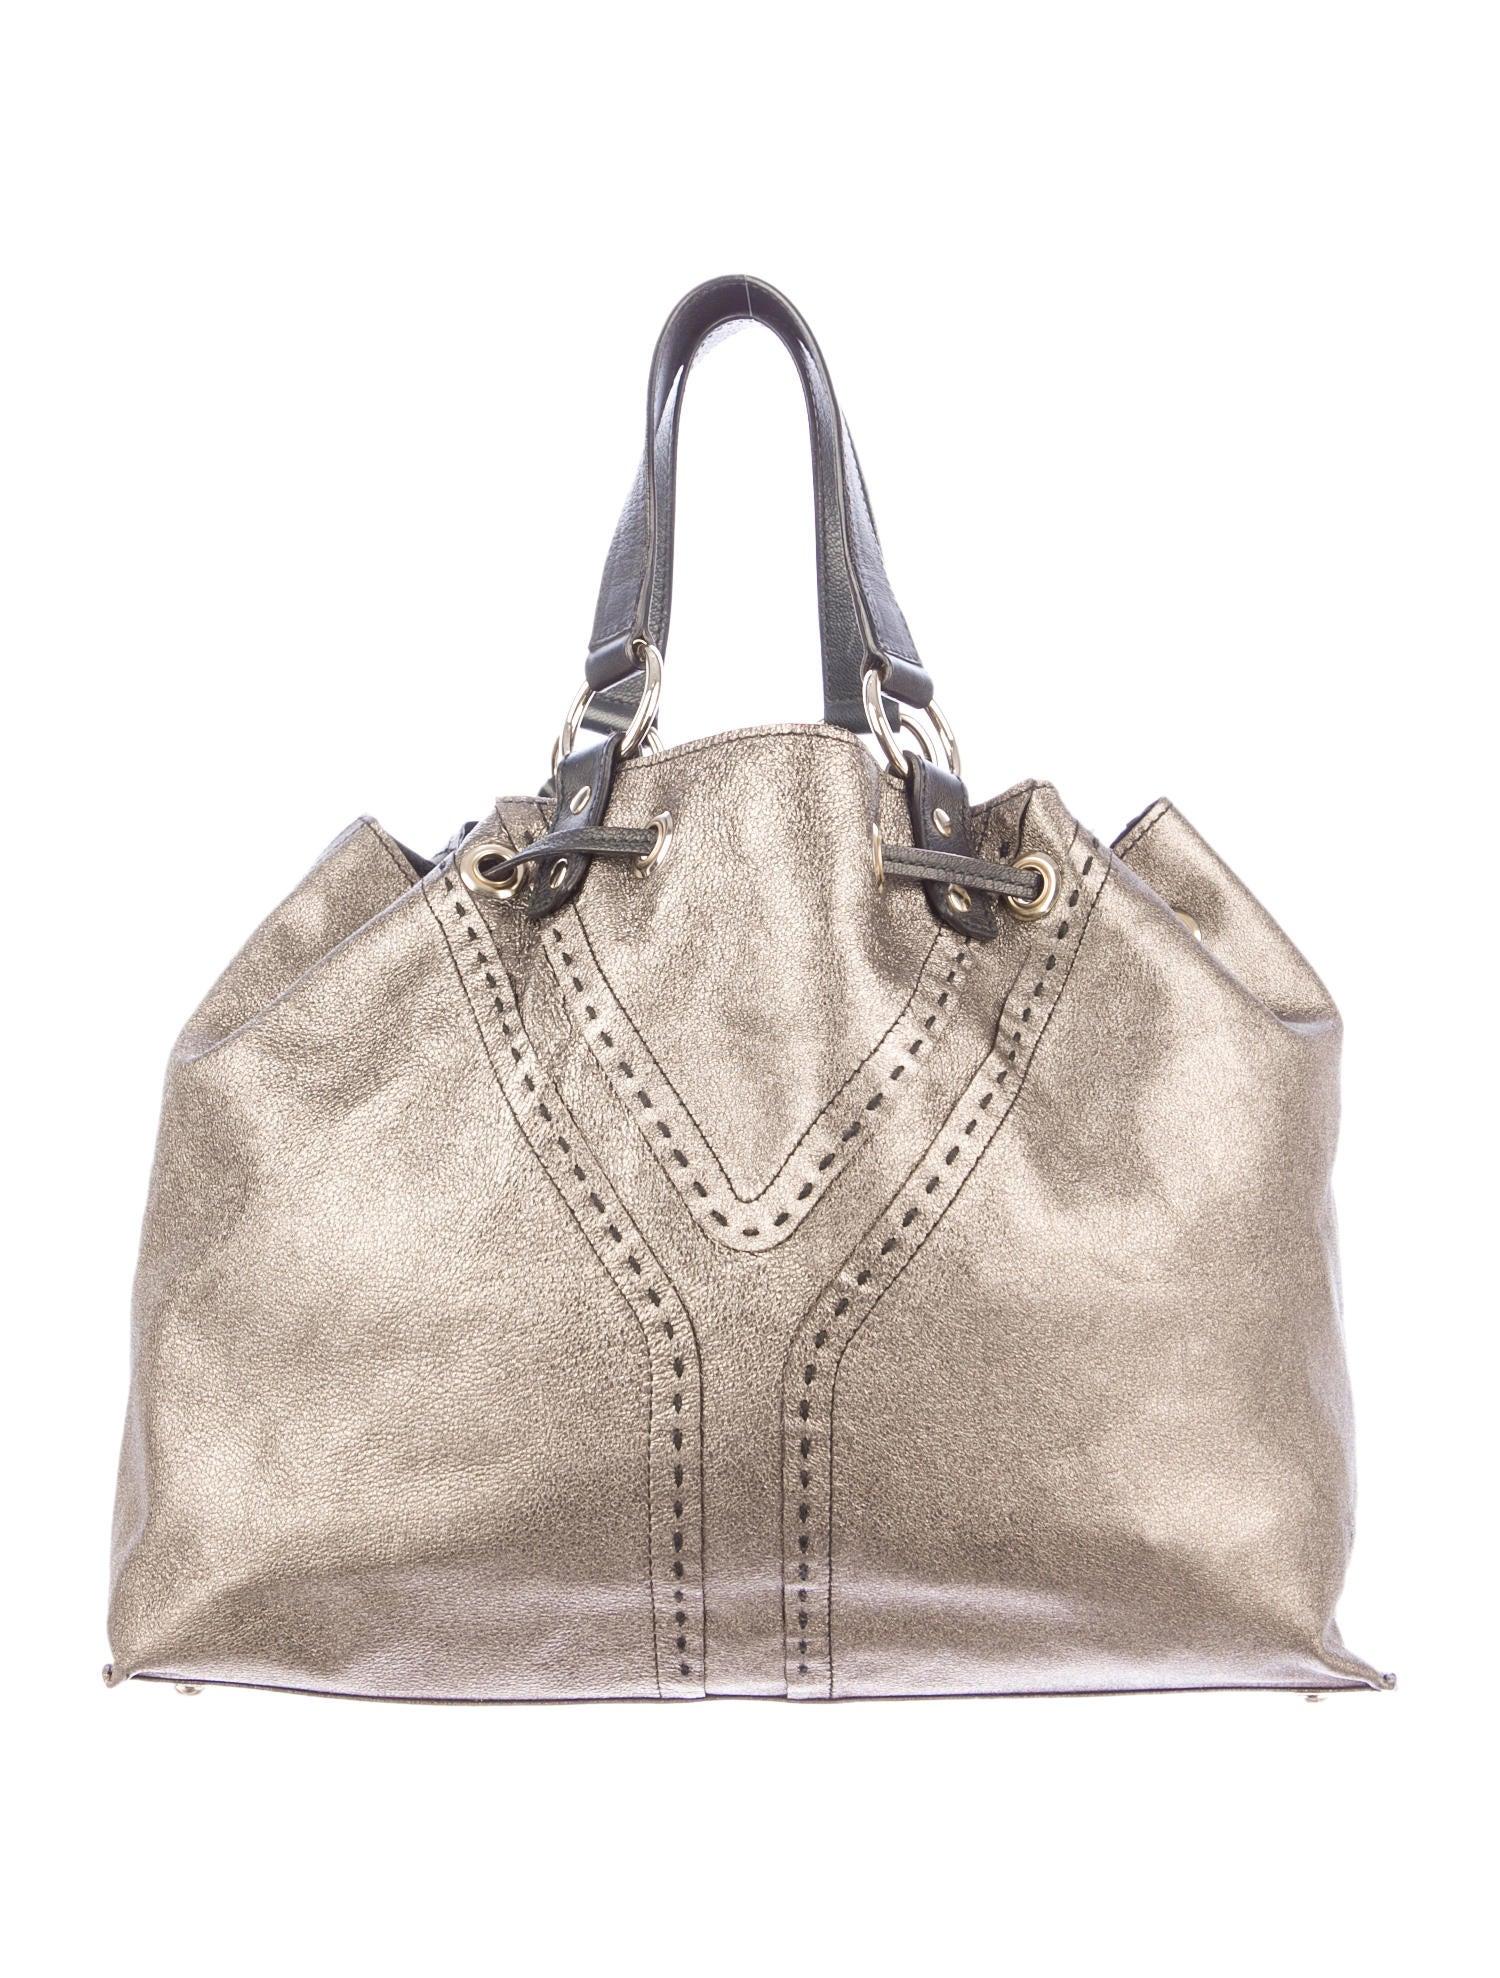 b7b79189971 ysl yves saint laurent shop online, replica ysl bags uk